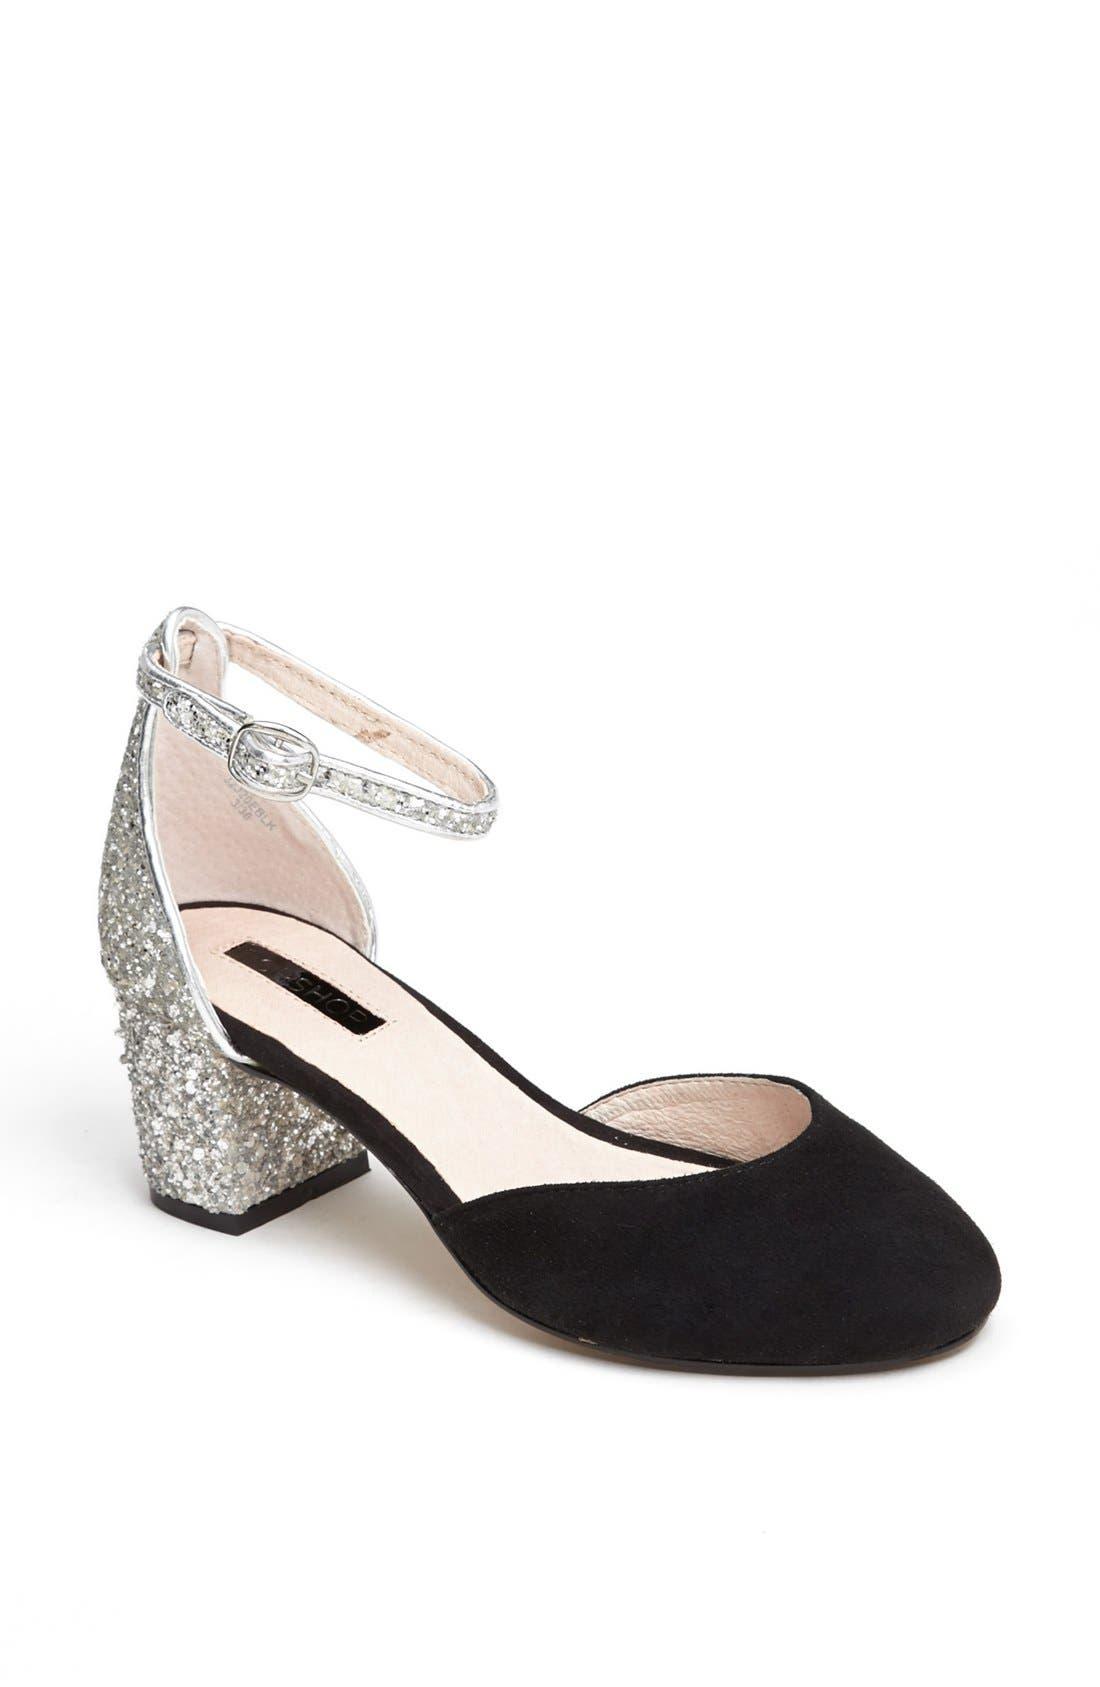 Main Image - Topshop 'Juniper' Glitter Heel Pump